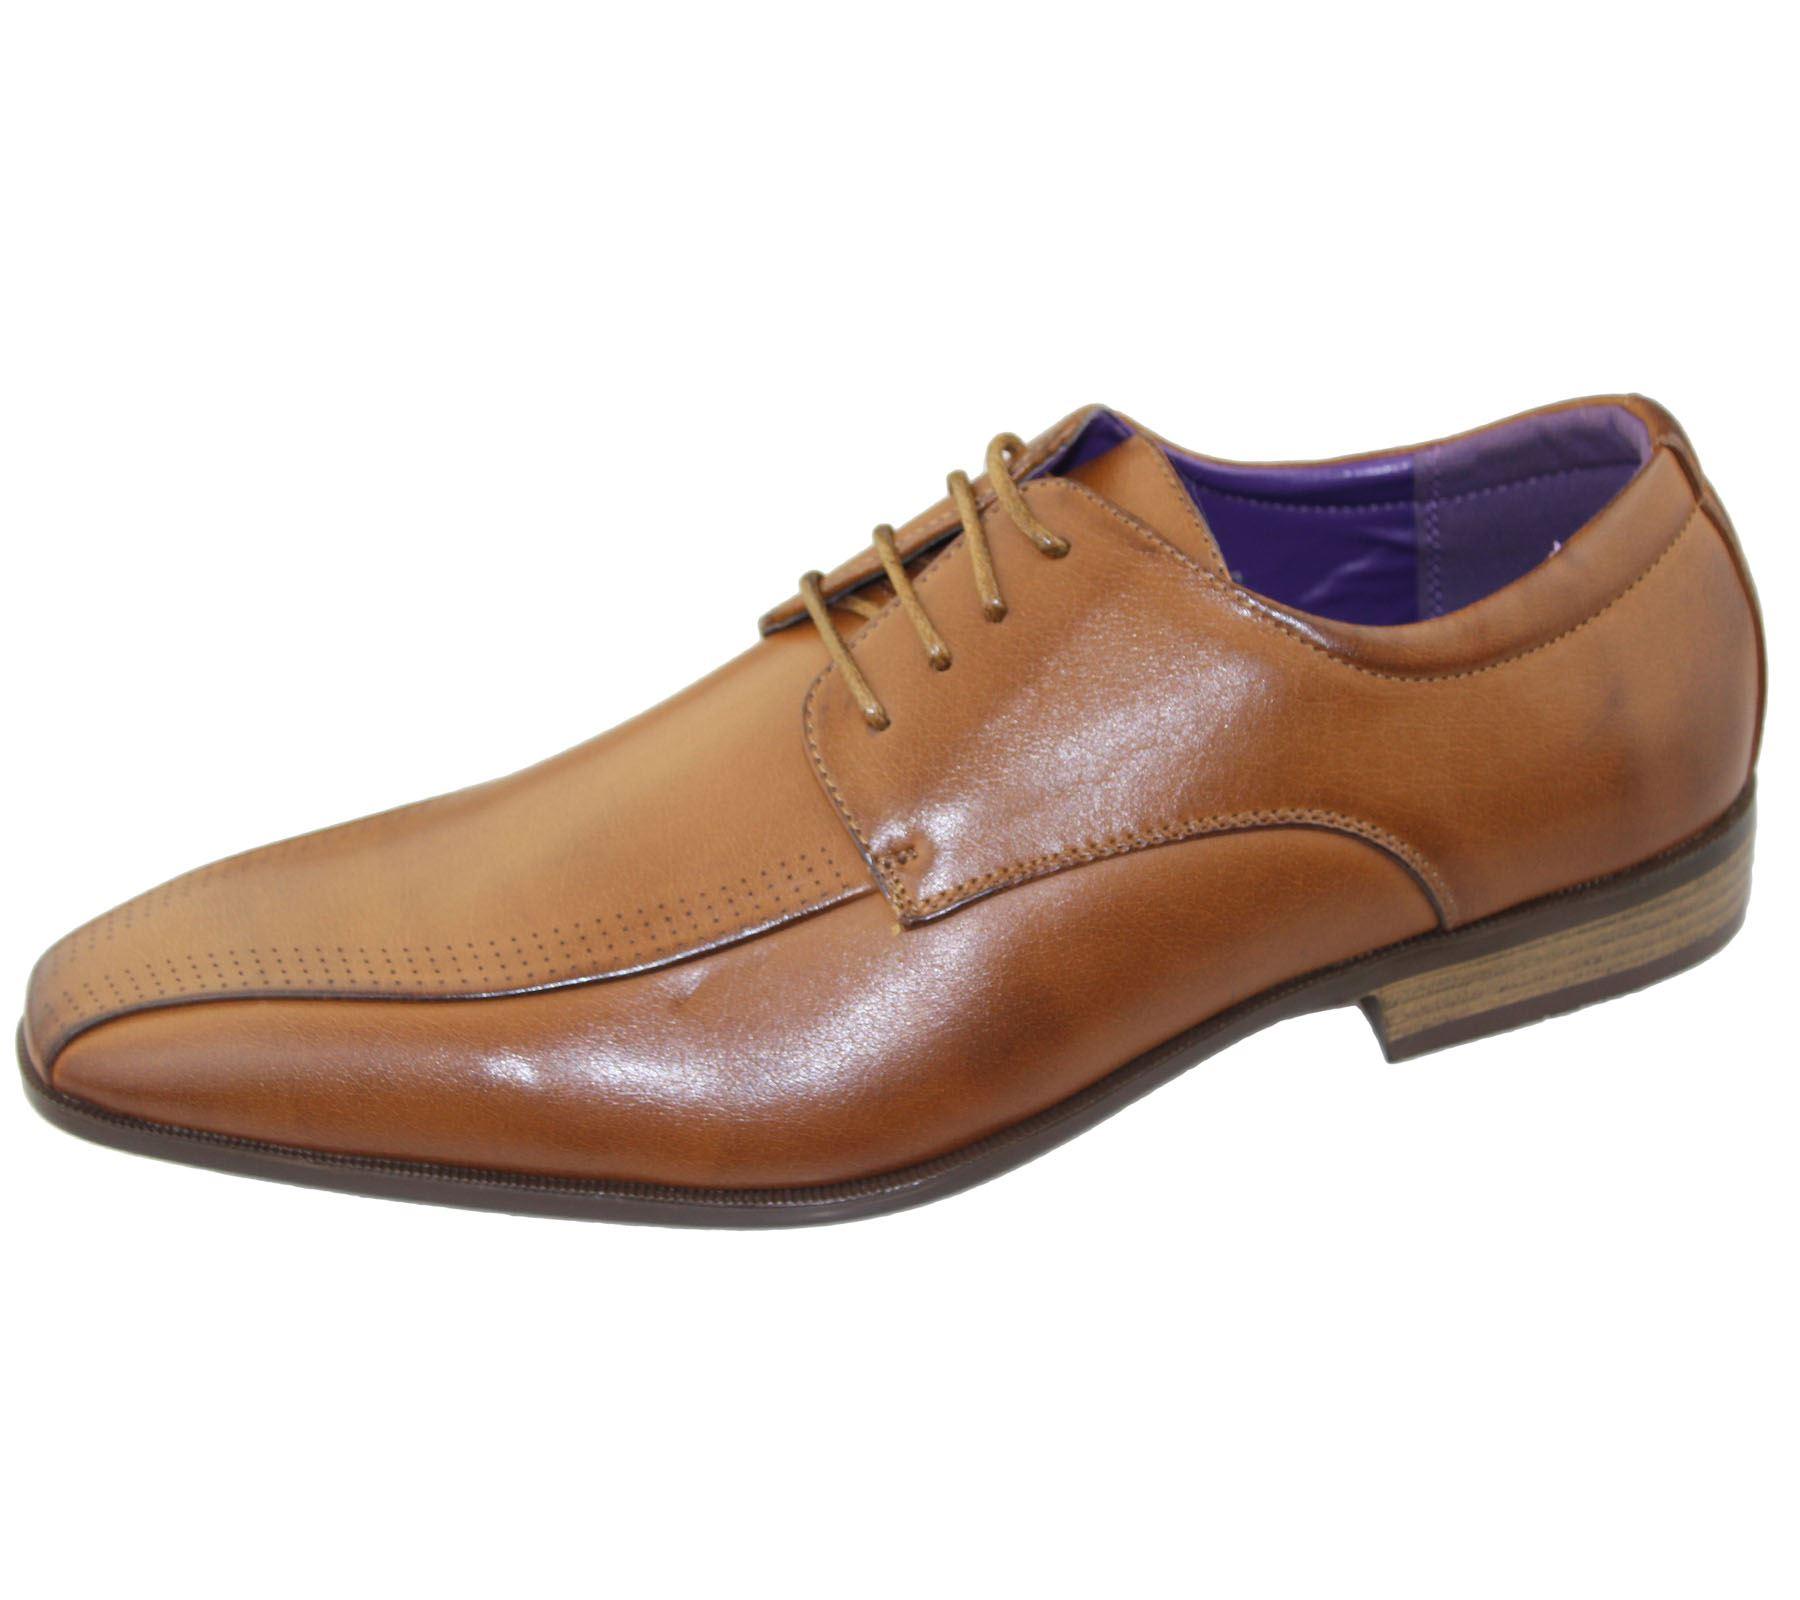 Casual Wedding Shoes 012 - Casual Wedding Shoes